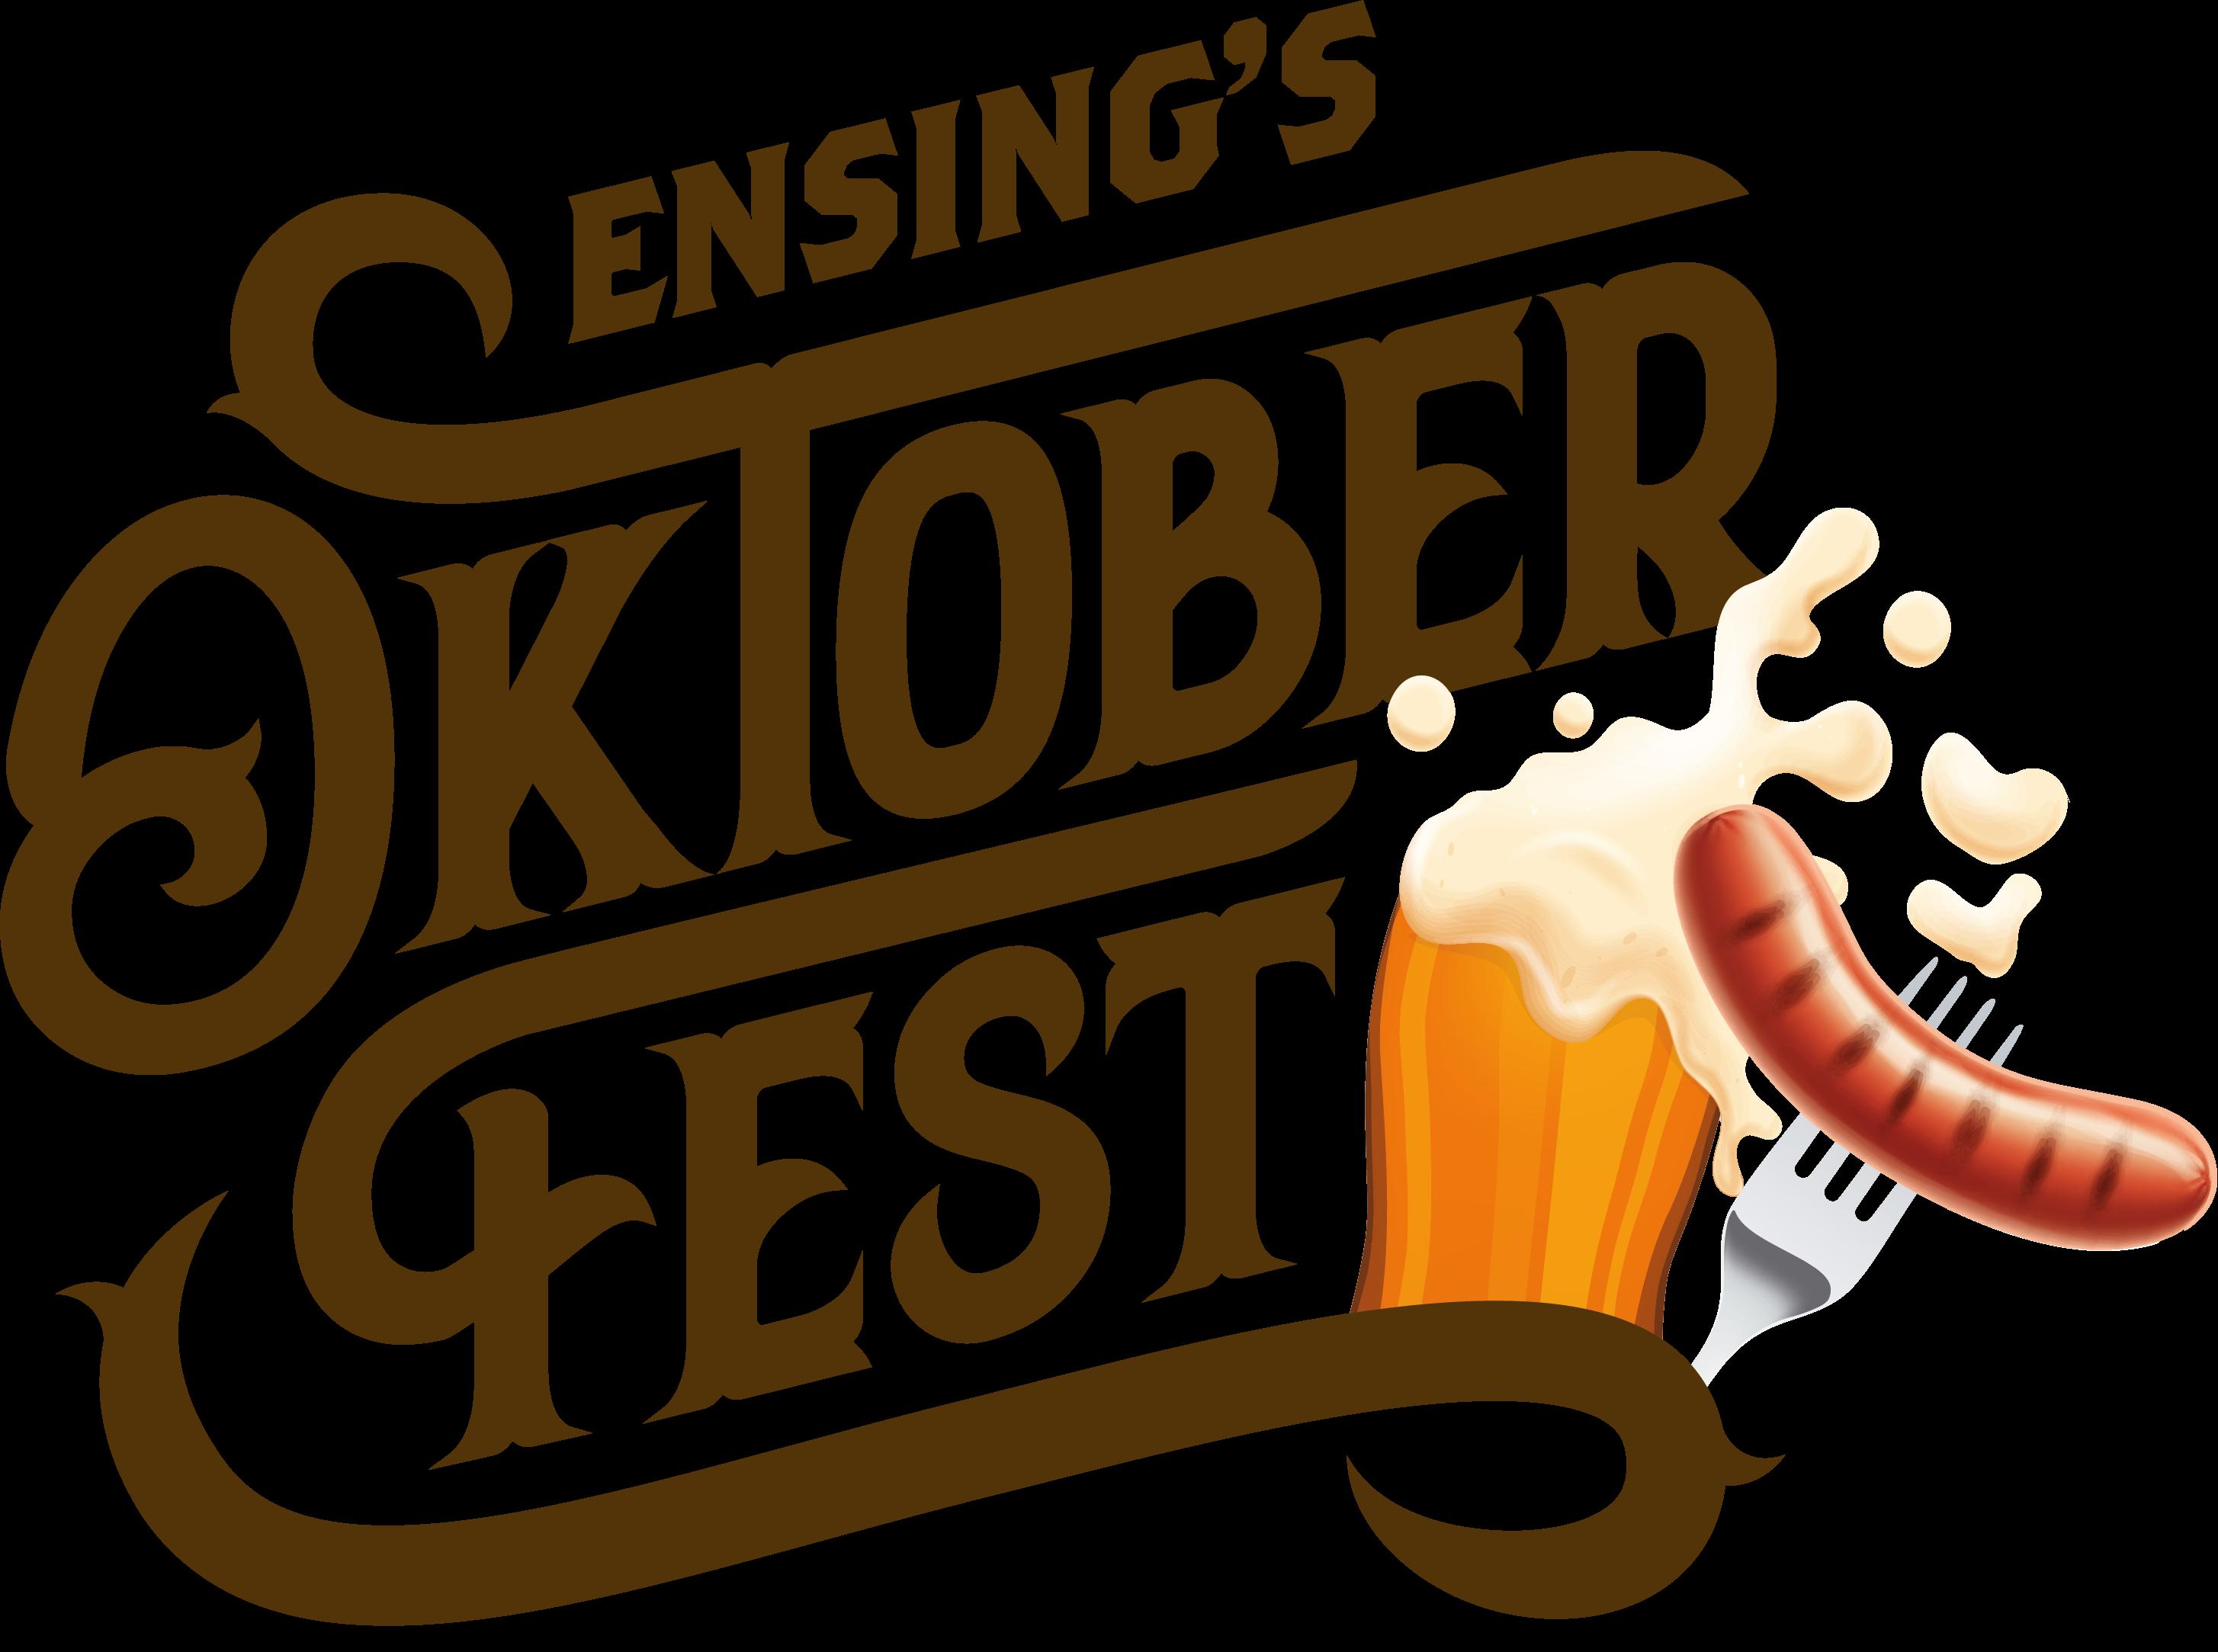 Apeldoorns Oktoberfest